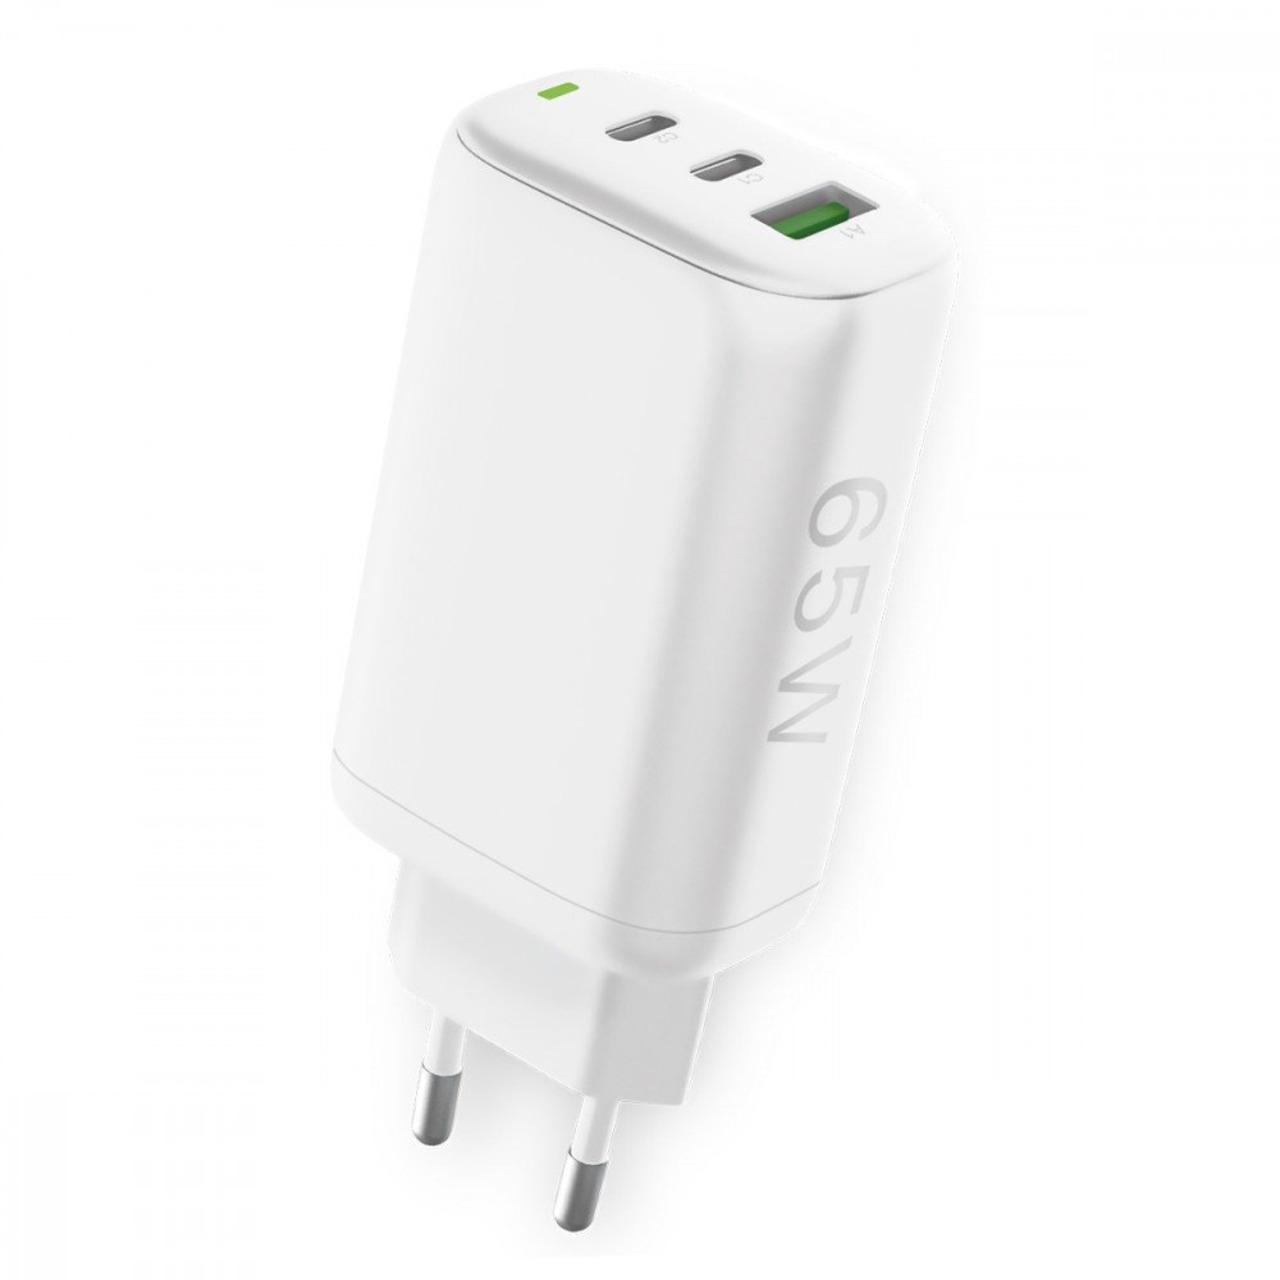 Fontastic USB-Schnell-Reiselader GaNto 65 W- weiss- Fast Charge und Power Delivery